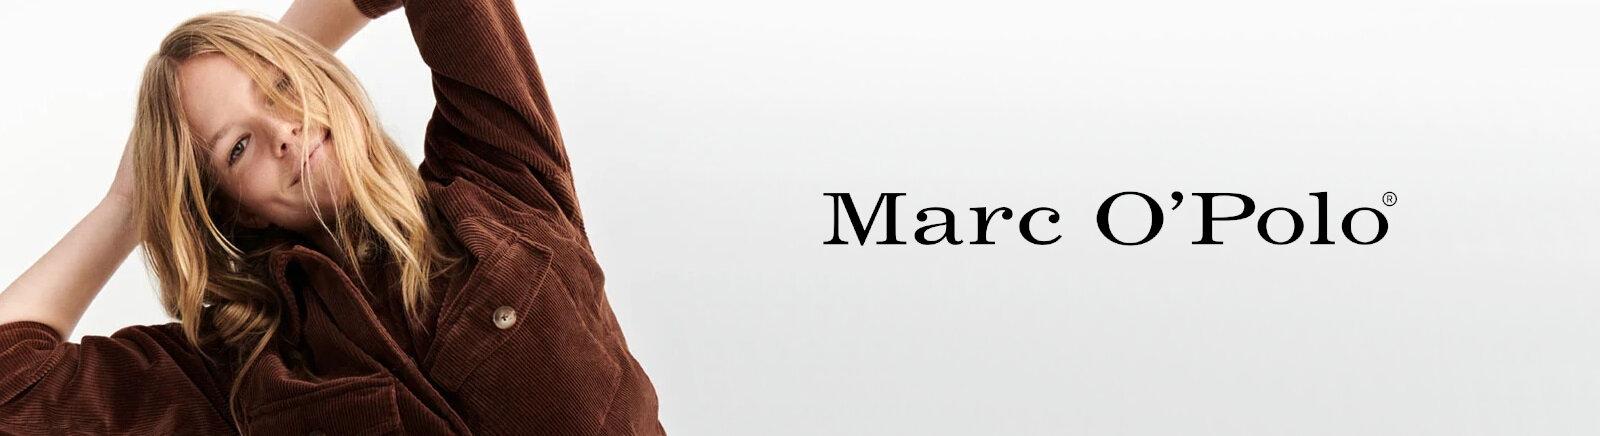 Juppen: Marc O'Polo Bootsschuhe für Damen kaufen online shoppen